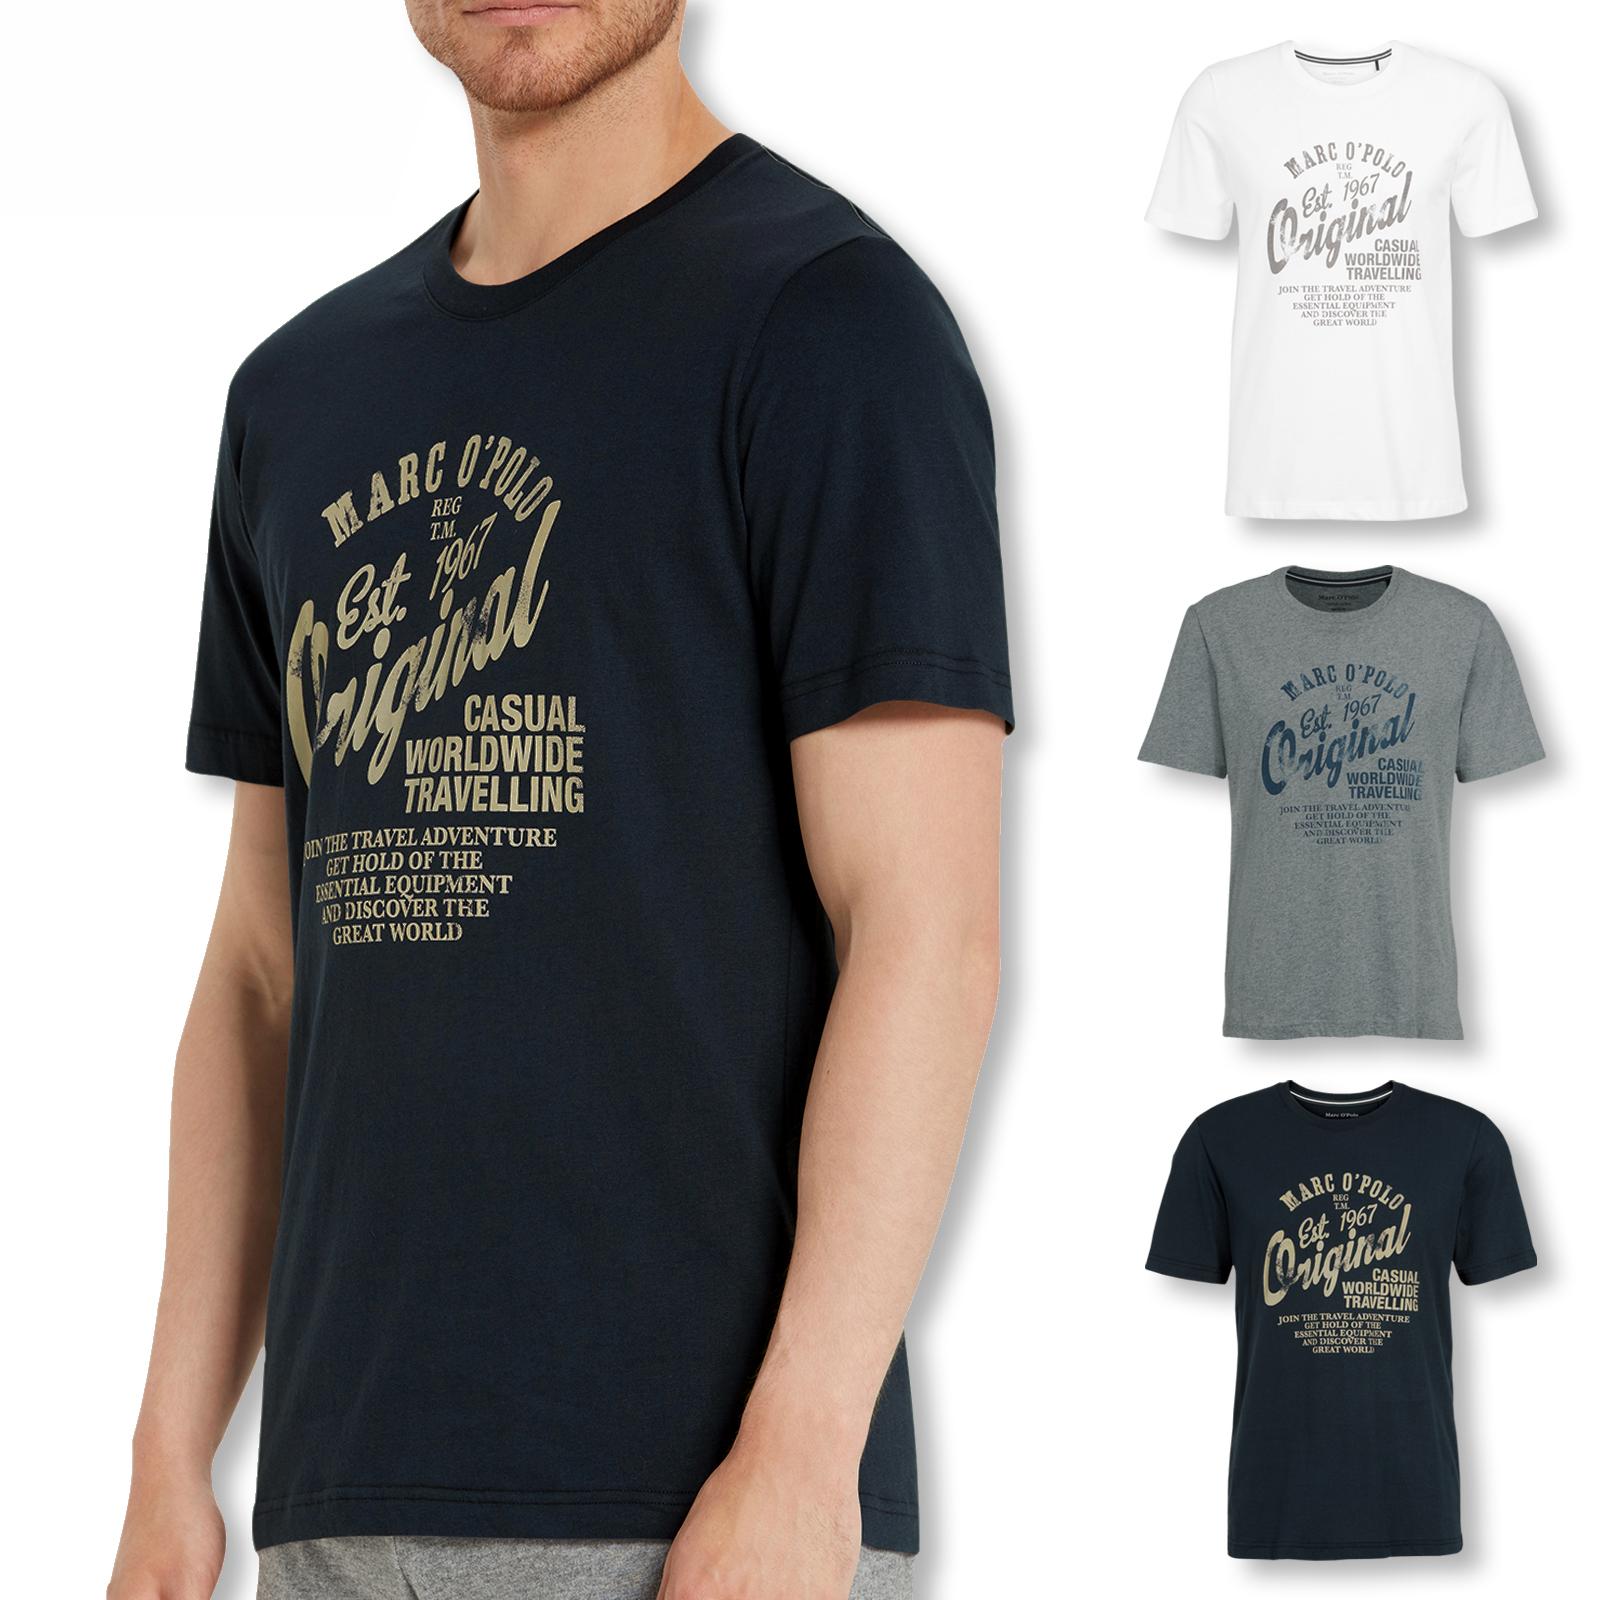 Marc O'Polo T-Shirt C-Neck Shirt kurzarm 154521 M L XL XXL in navy